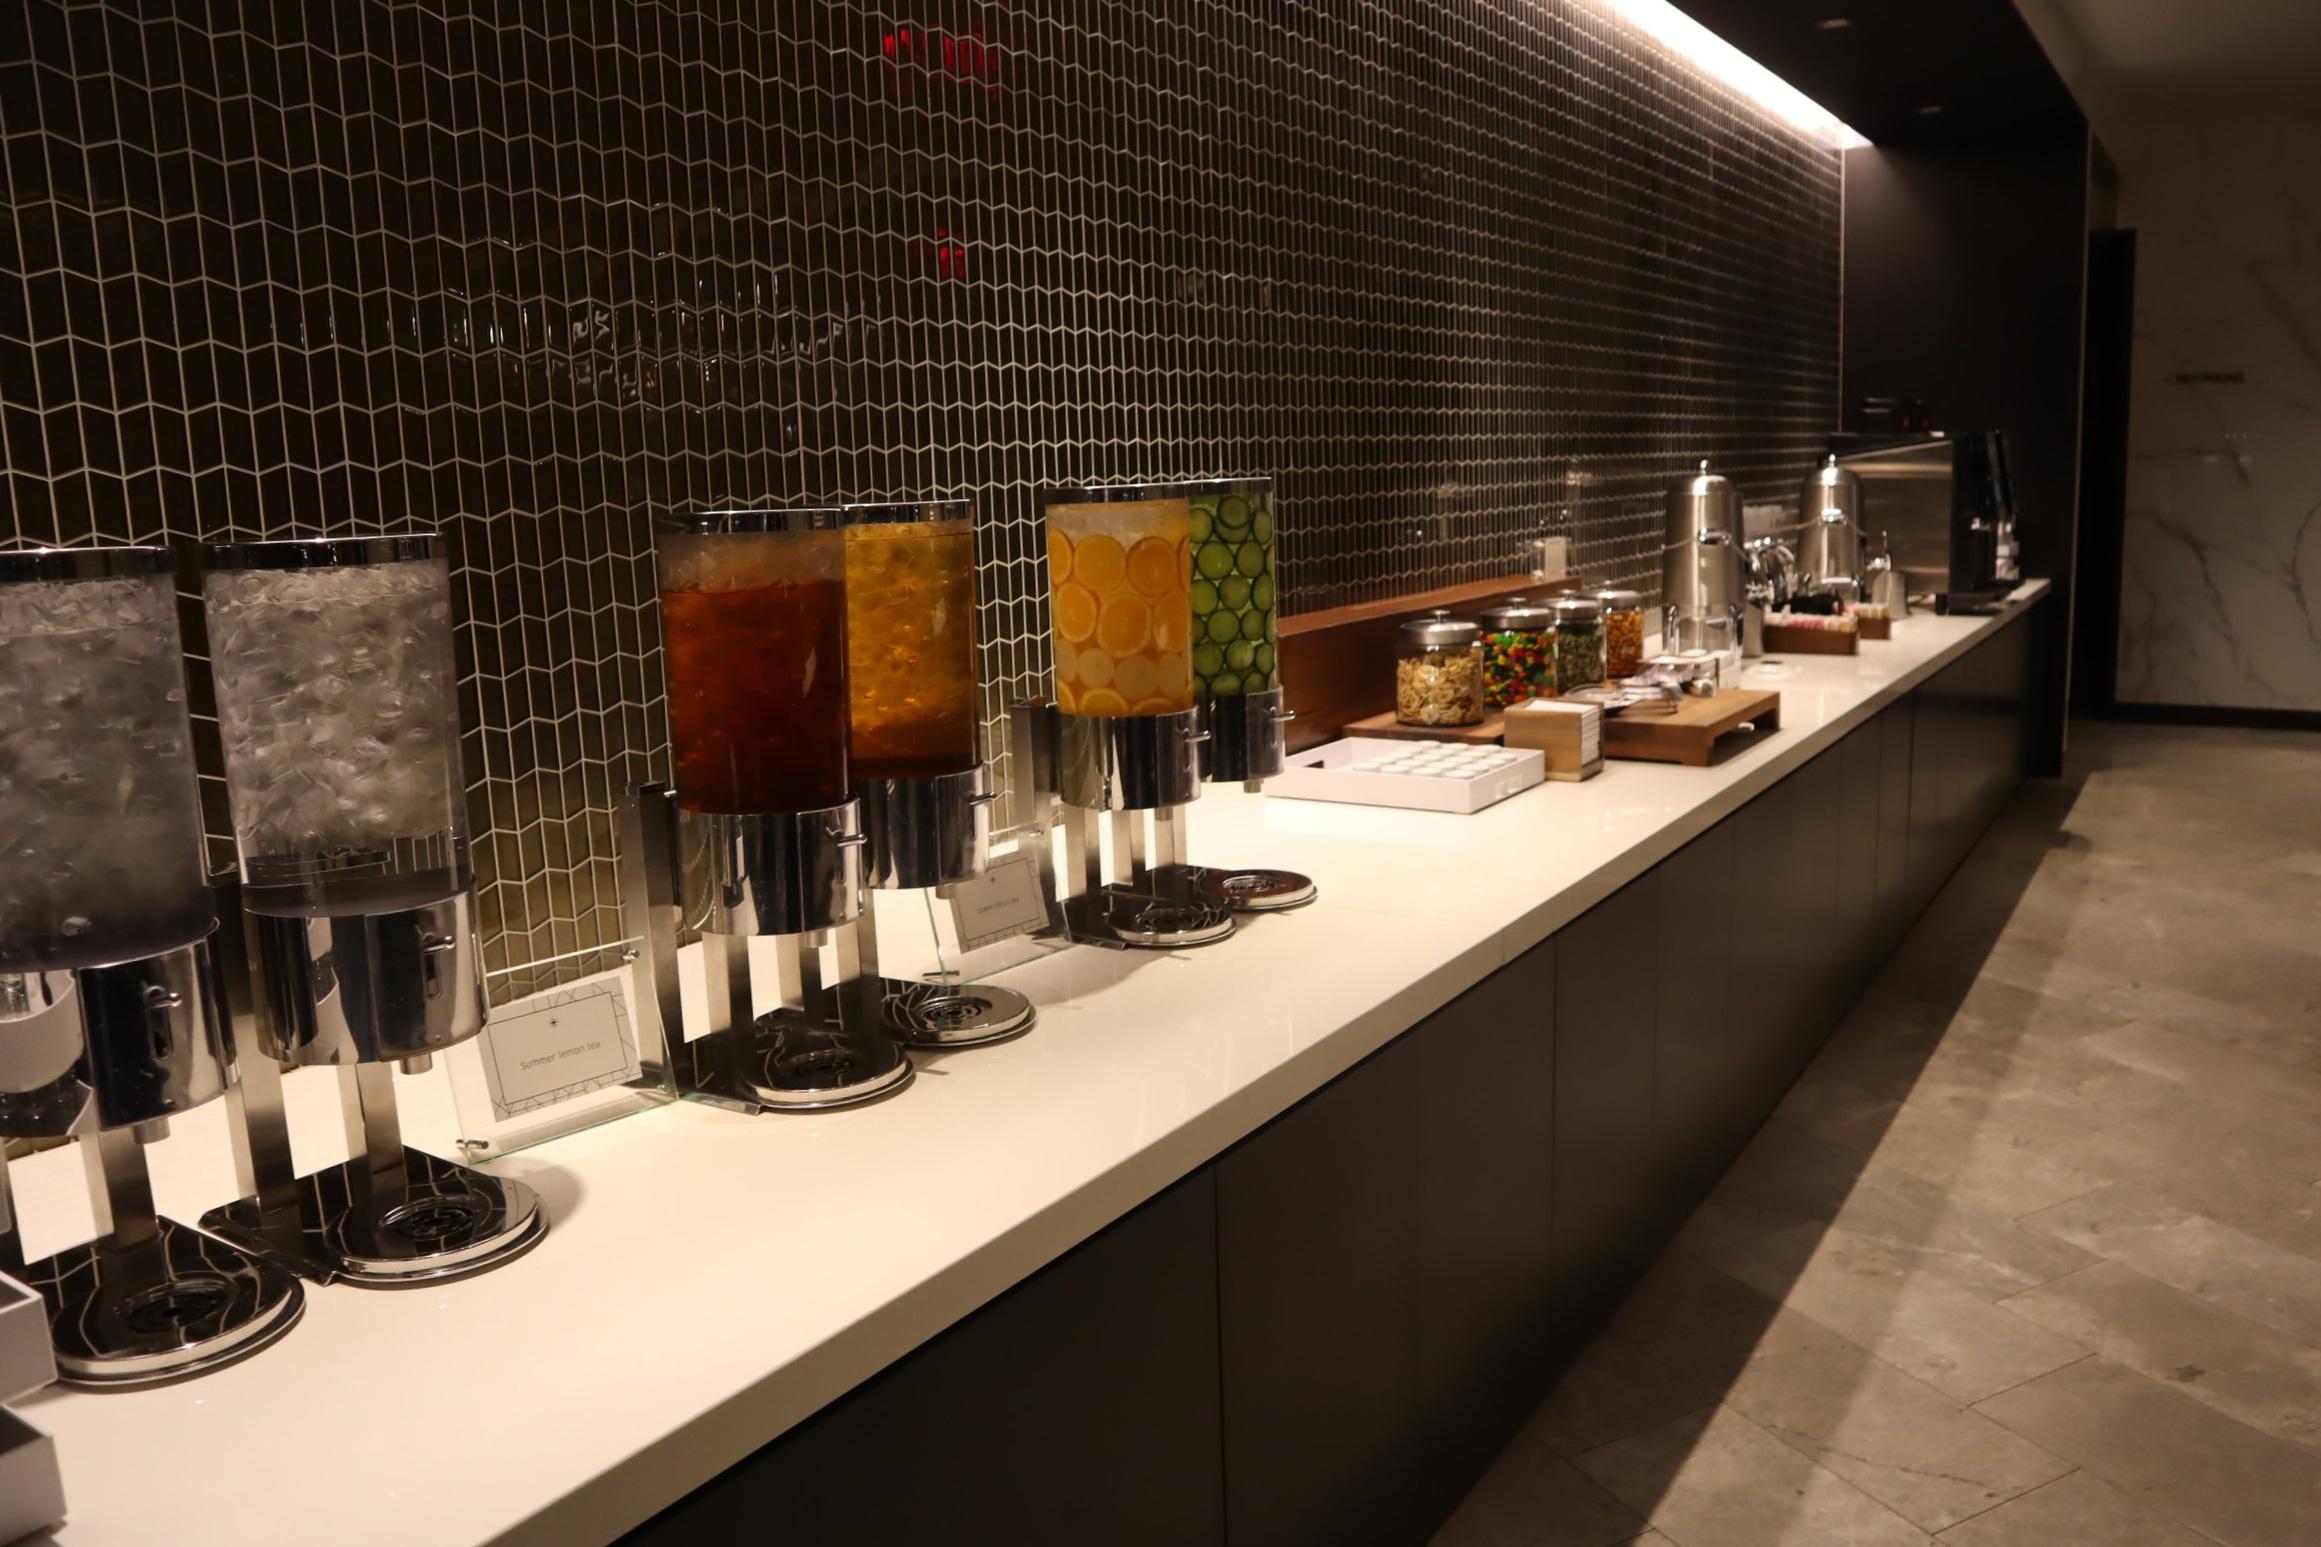 United Polaris Lounge Newark – Drinks counter